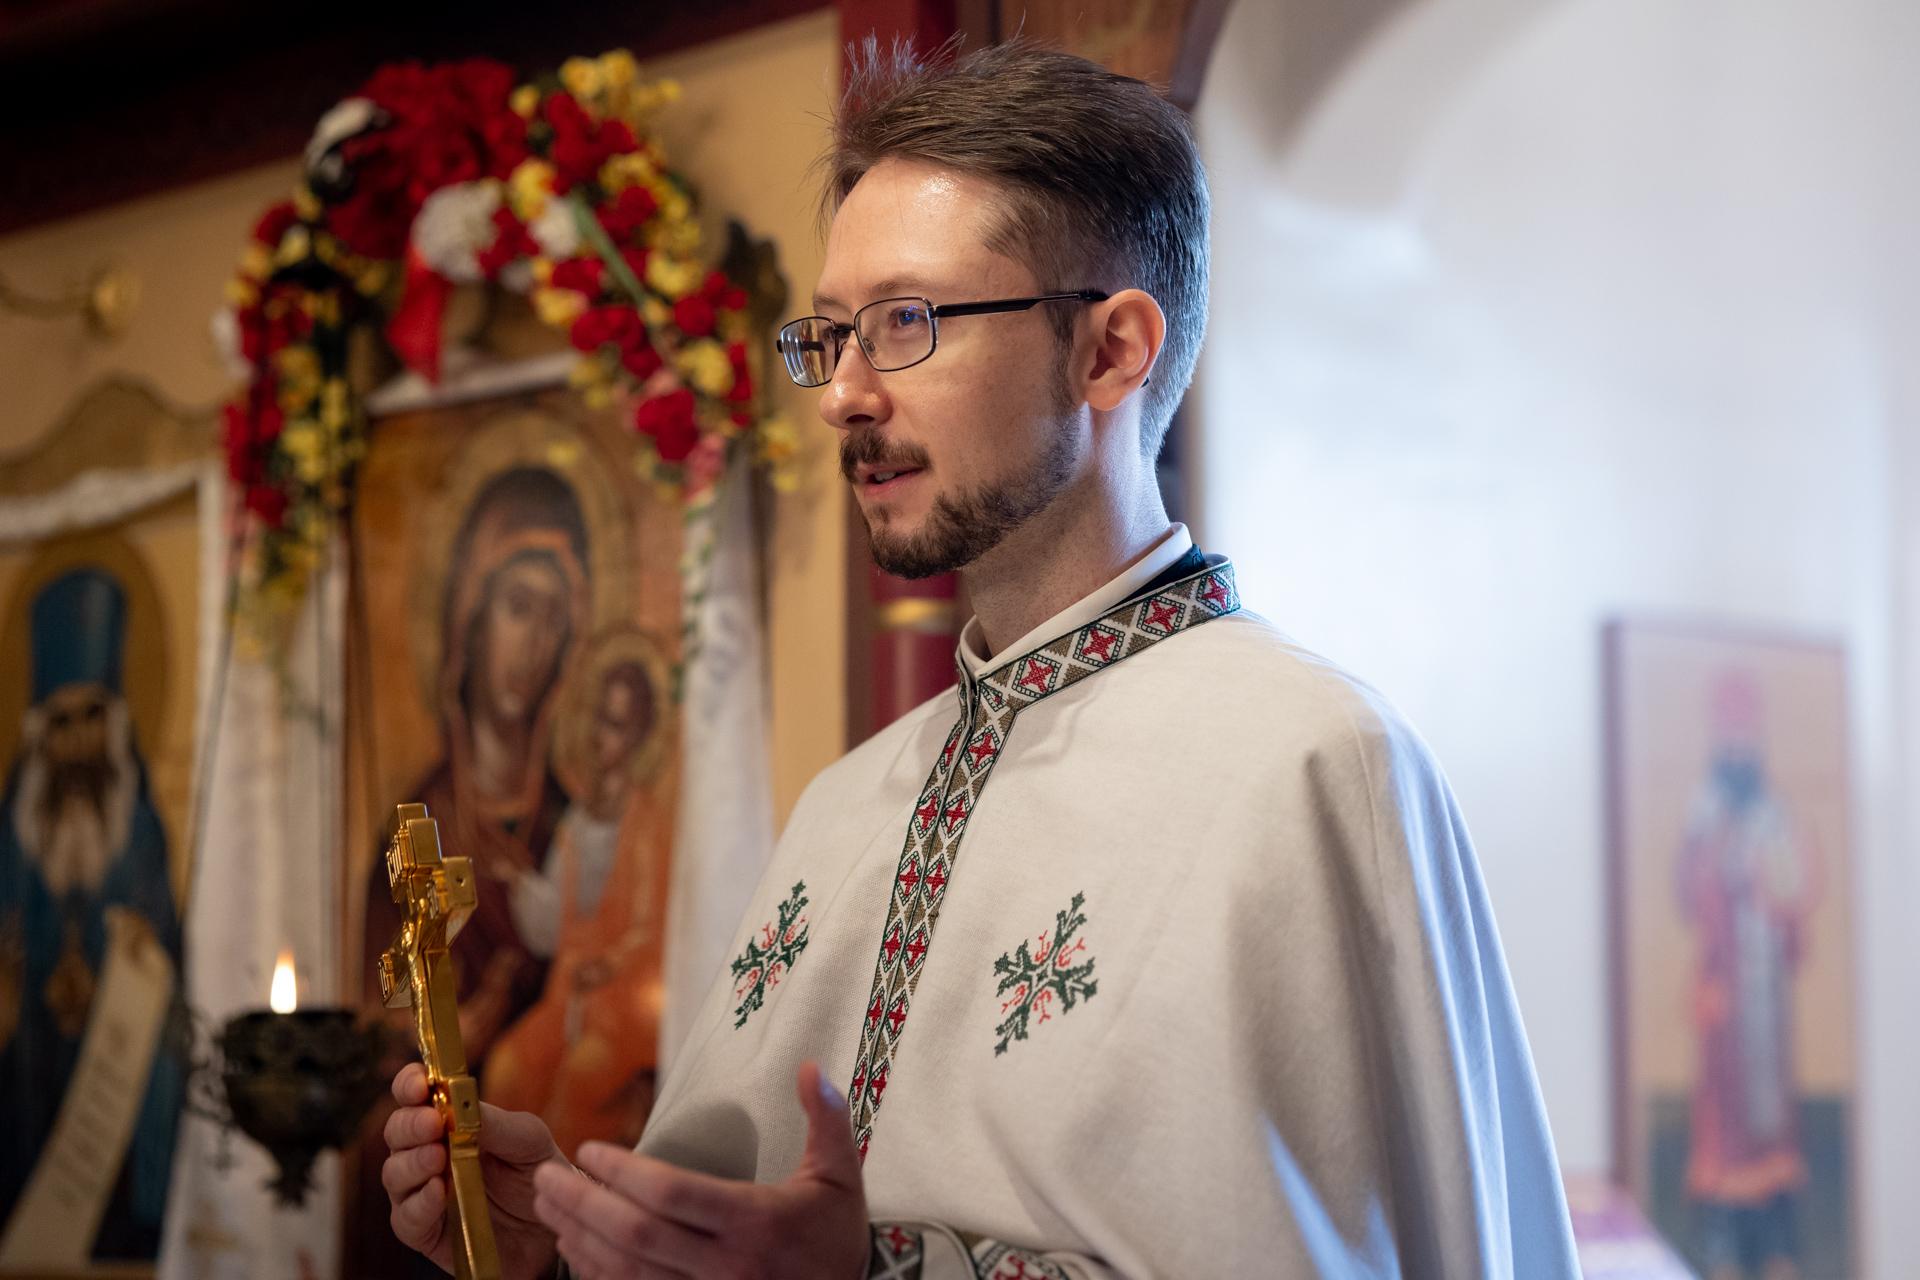 Fr John Suvak preaching in church